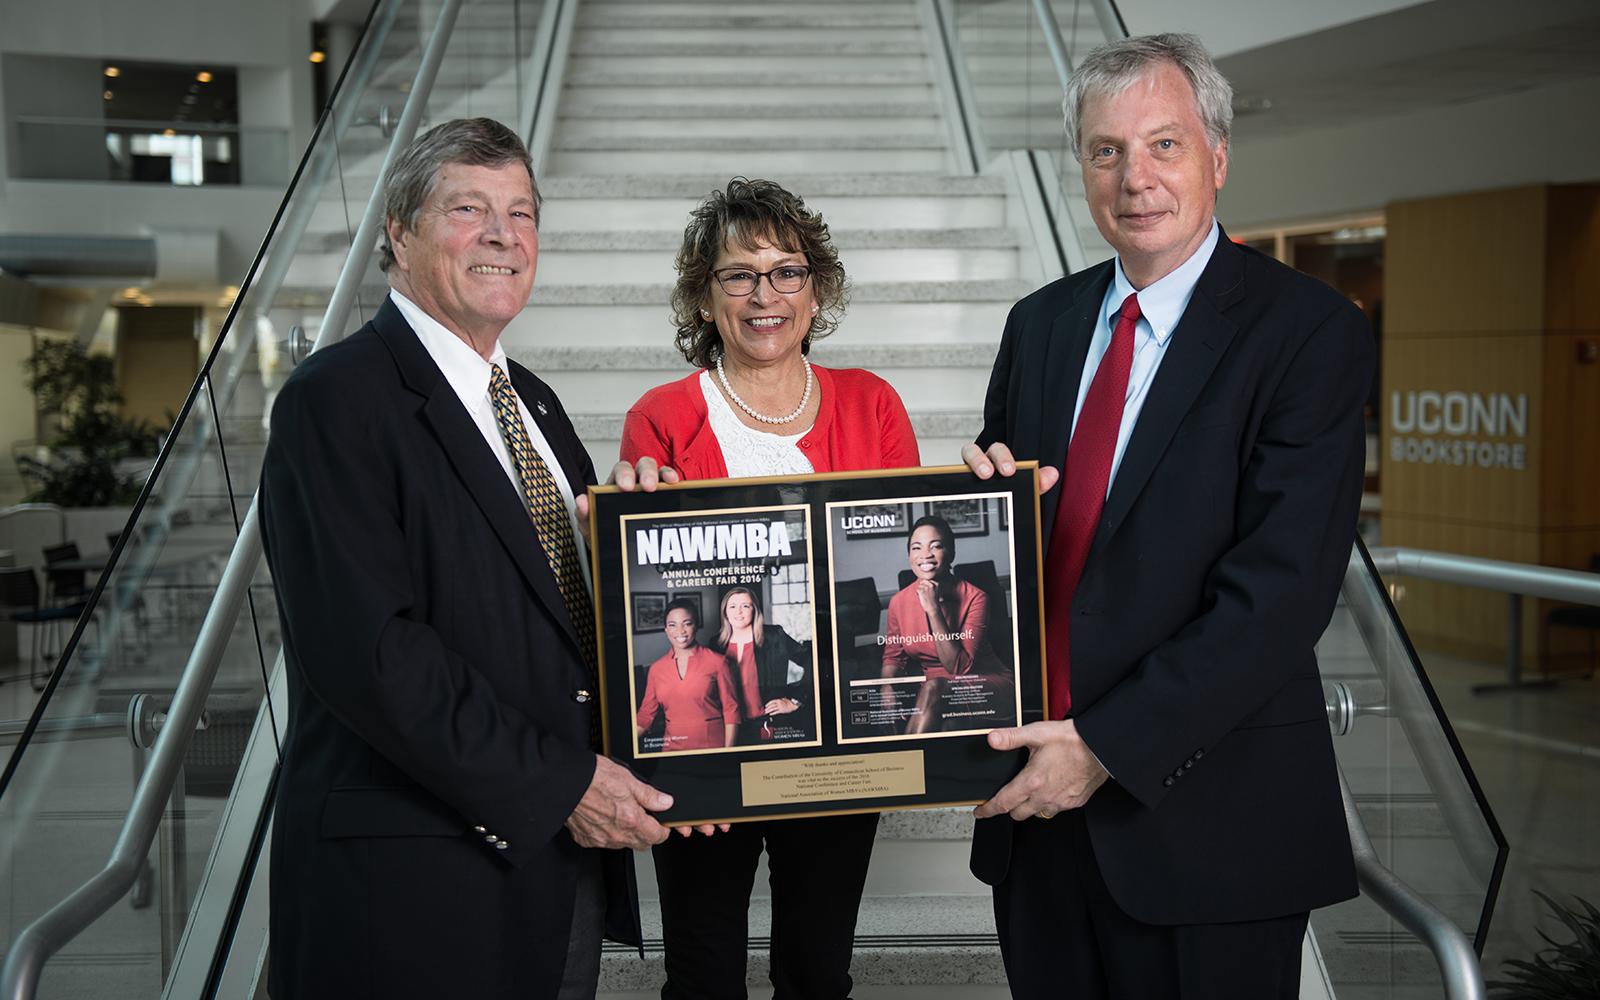 NAWMBA plaque presented to John Elliott, Marlys Rizzi, John Knopf (Nathan Oldham/UConn School of Business)